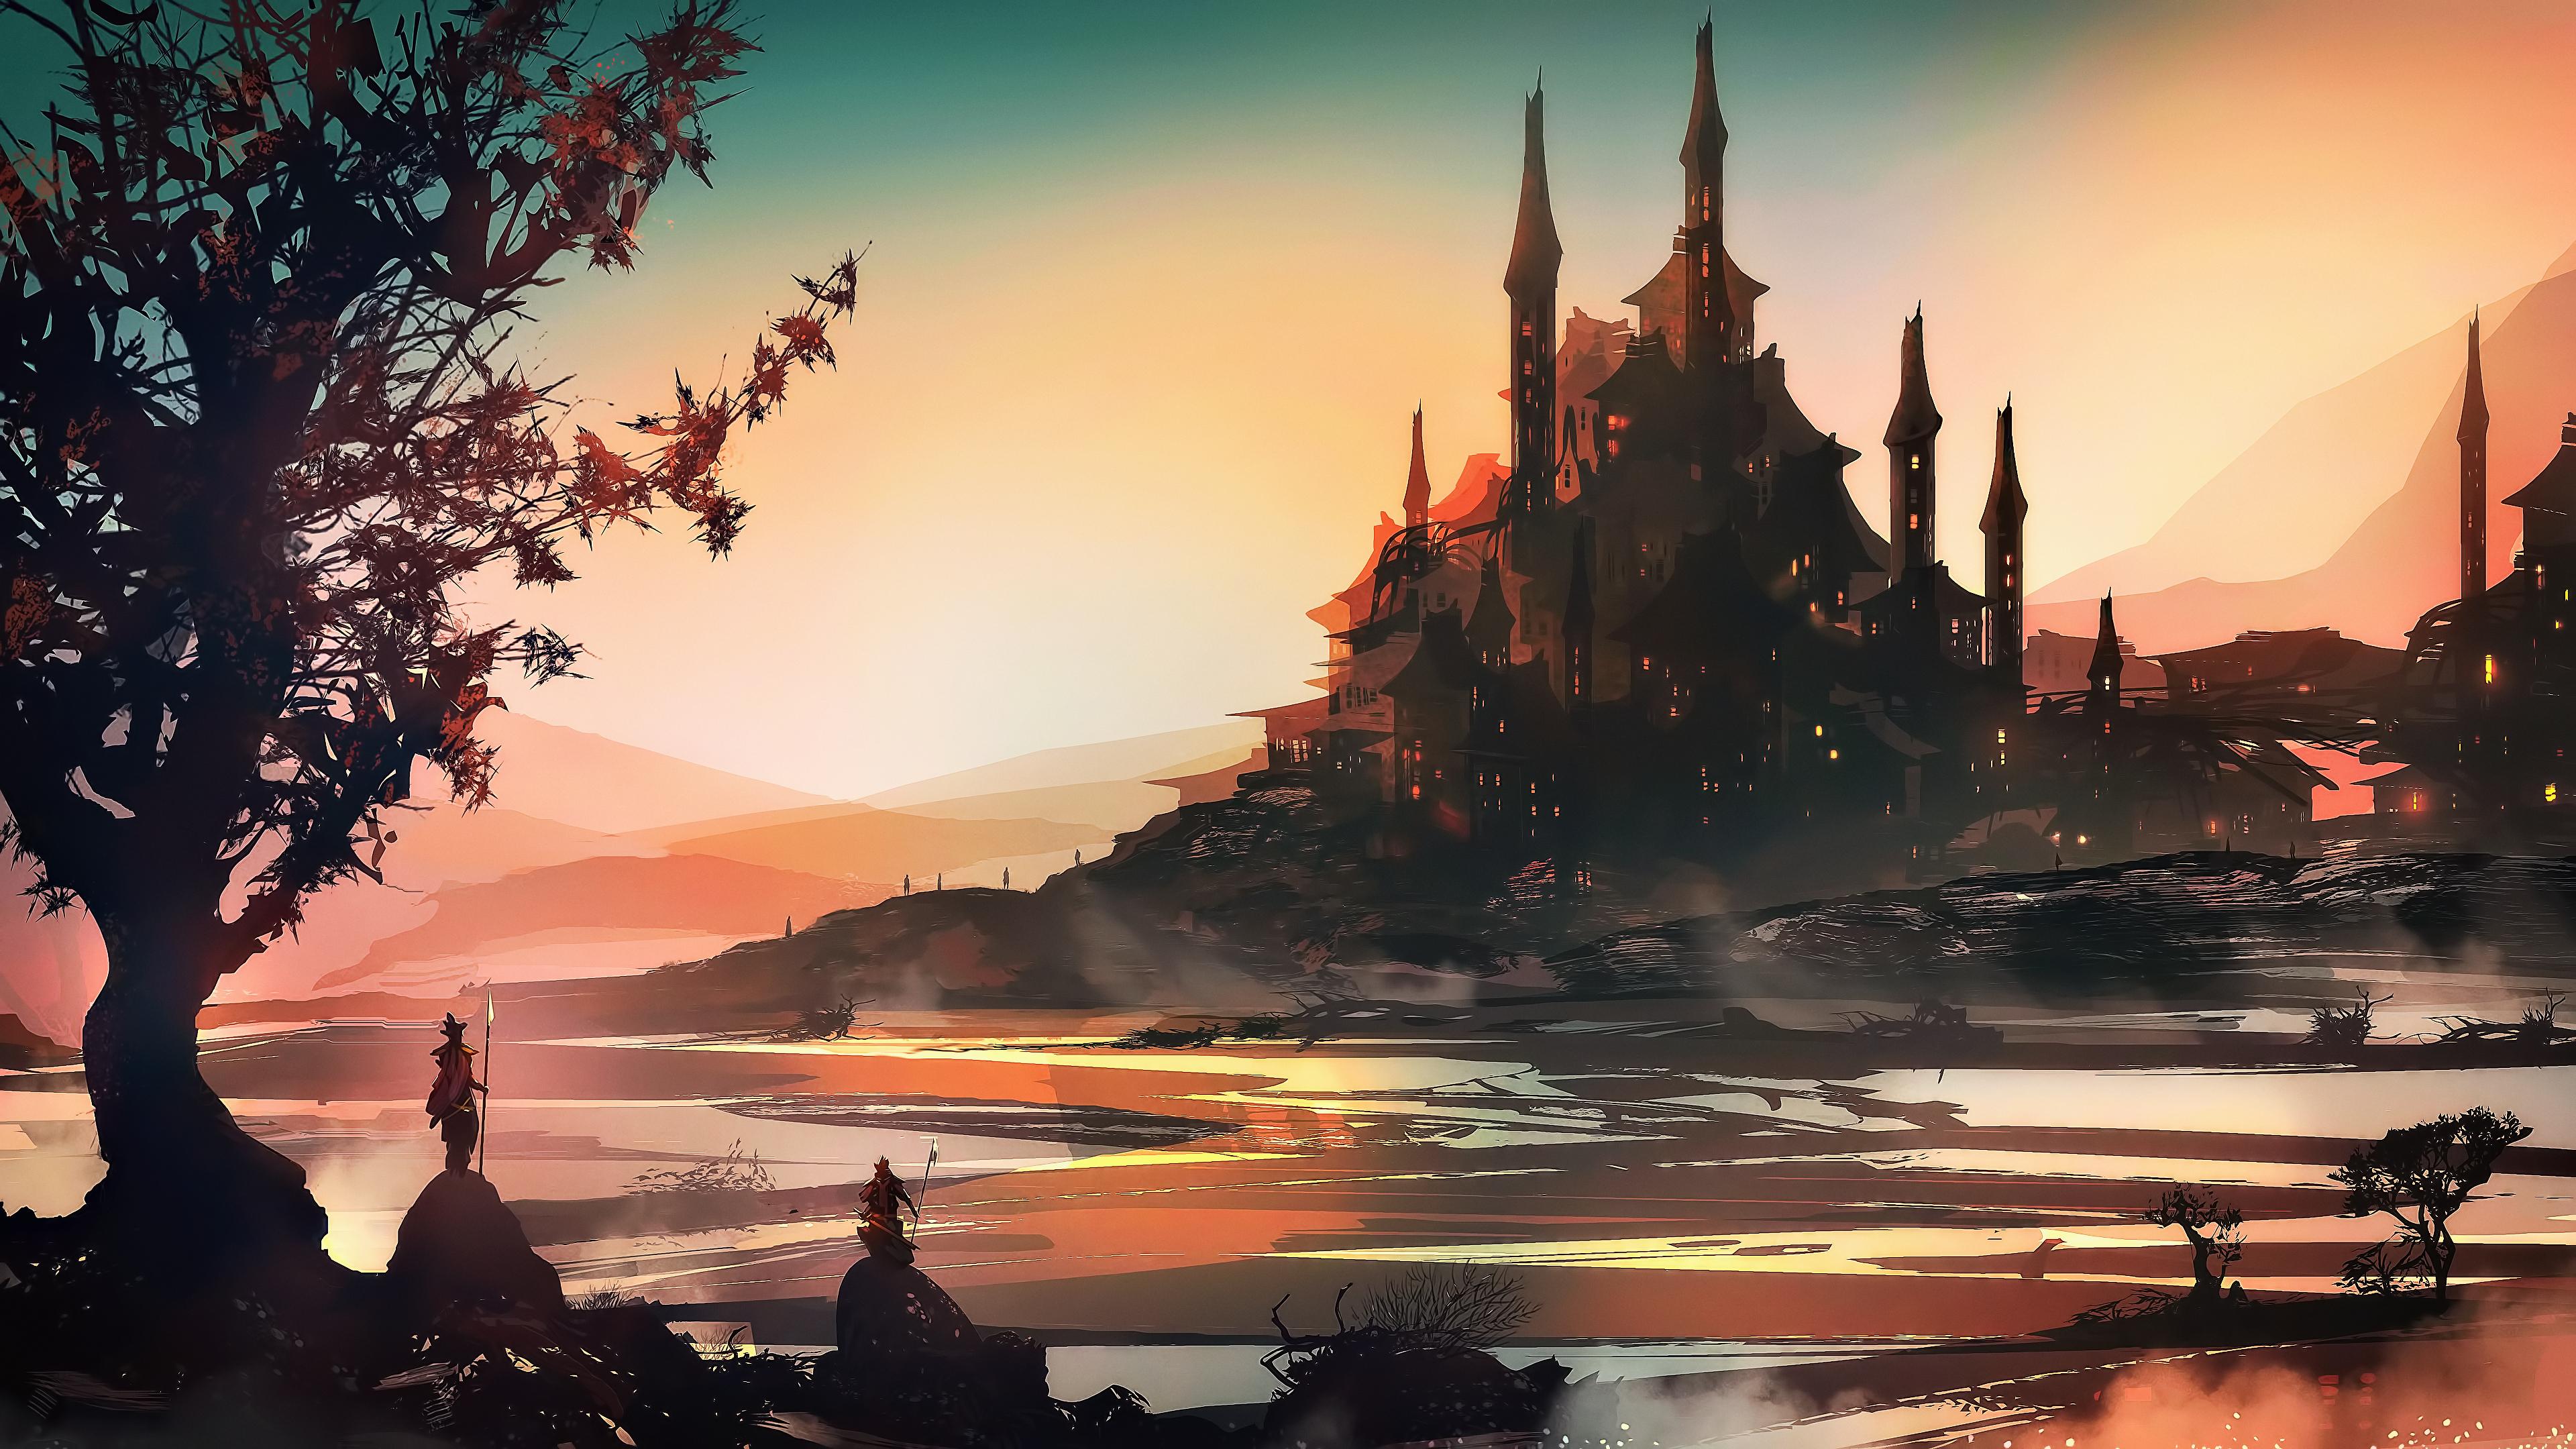 Fantasy Art Landscape Concept Art 4k Hd Artist 4k Wallpapers Images Backgrounds Photos And Pictures